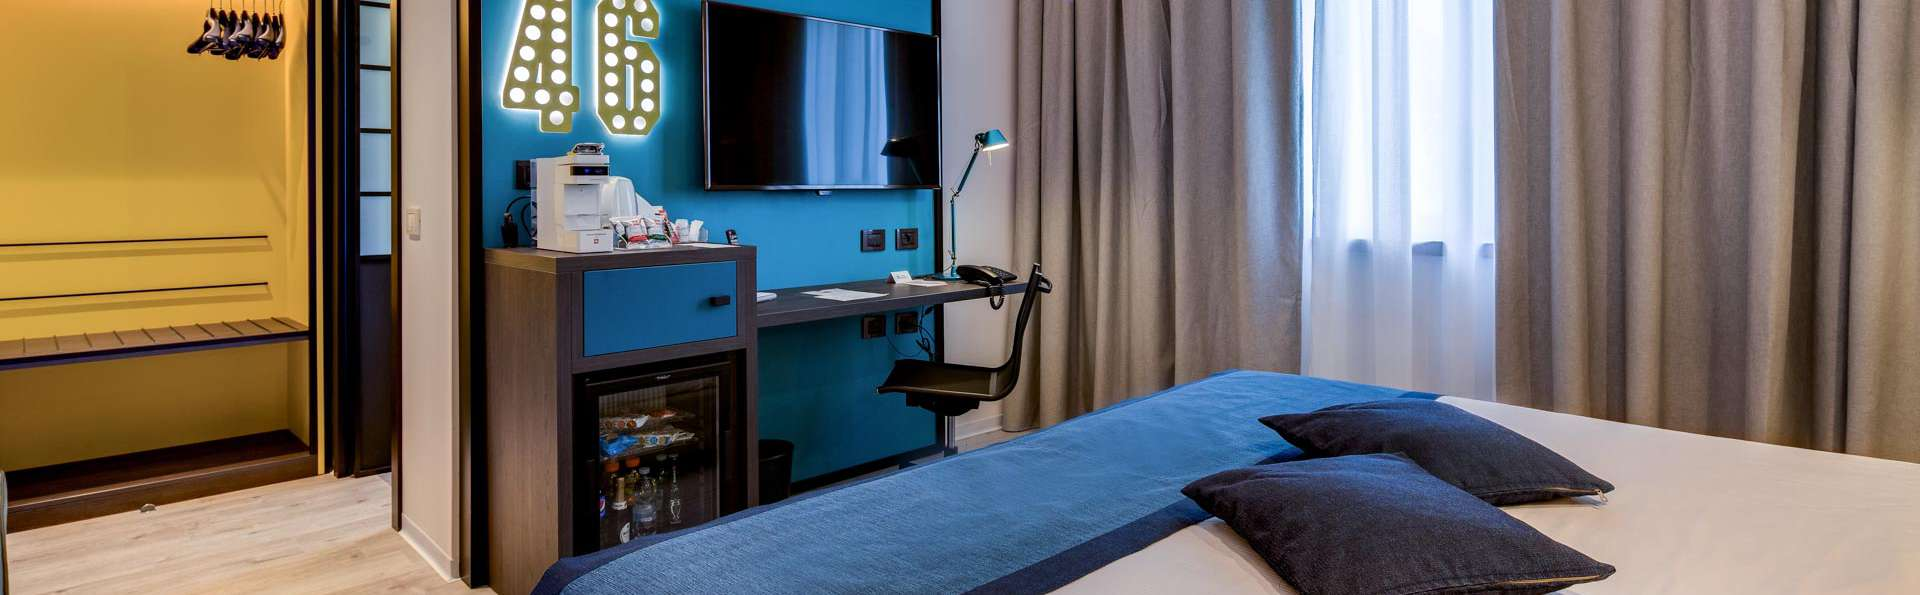 Best Western Hotel Cristallo - EDIT_ROOM_01.jpg